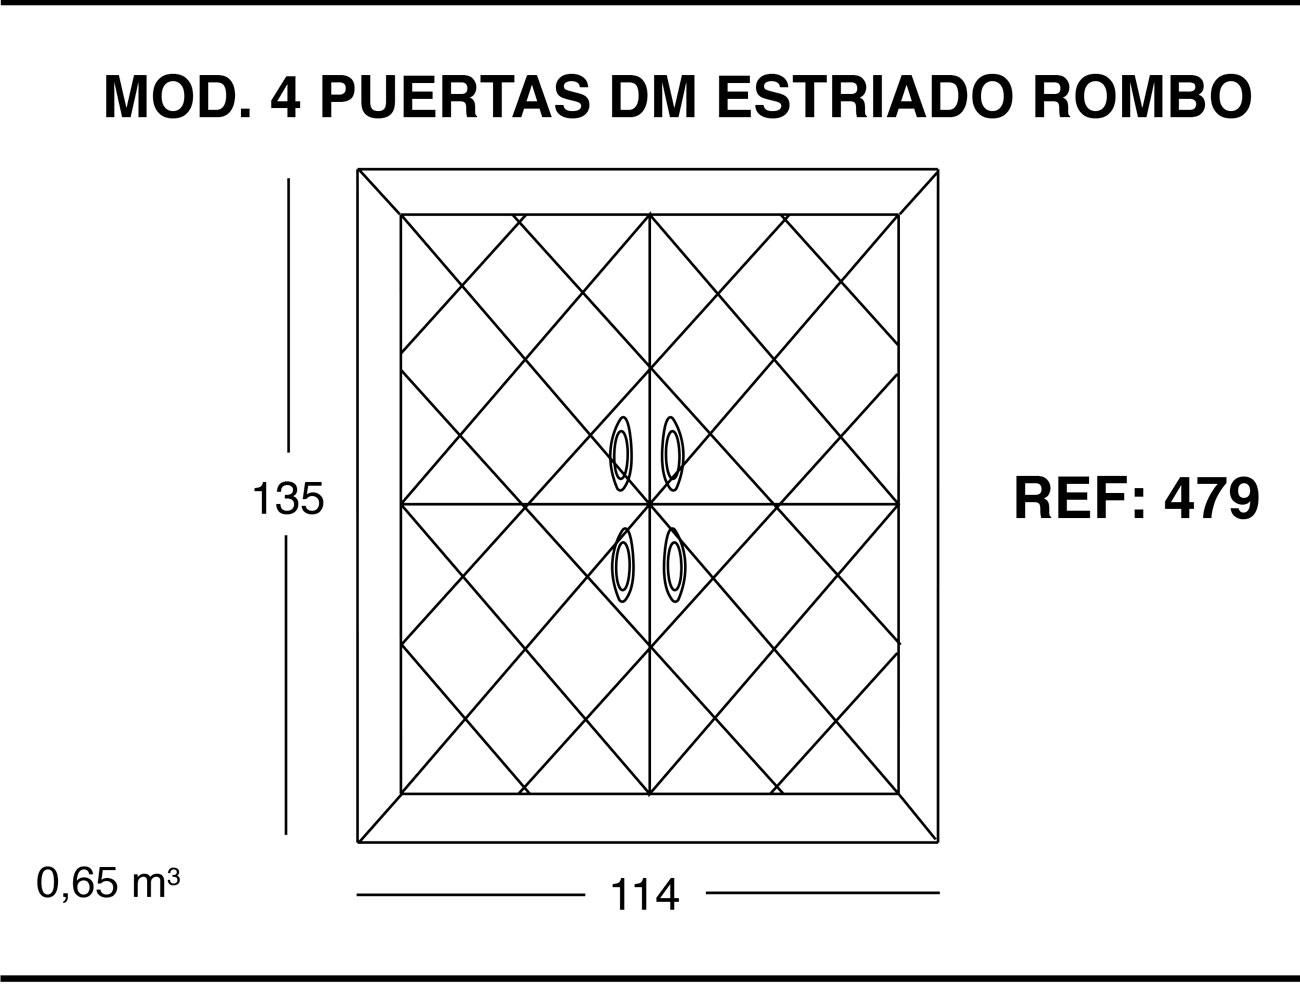 Modulo 4 puertas dm estriado rombo